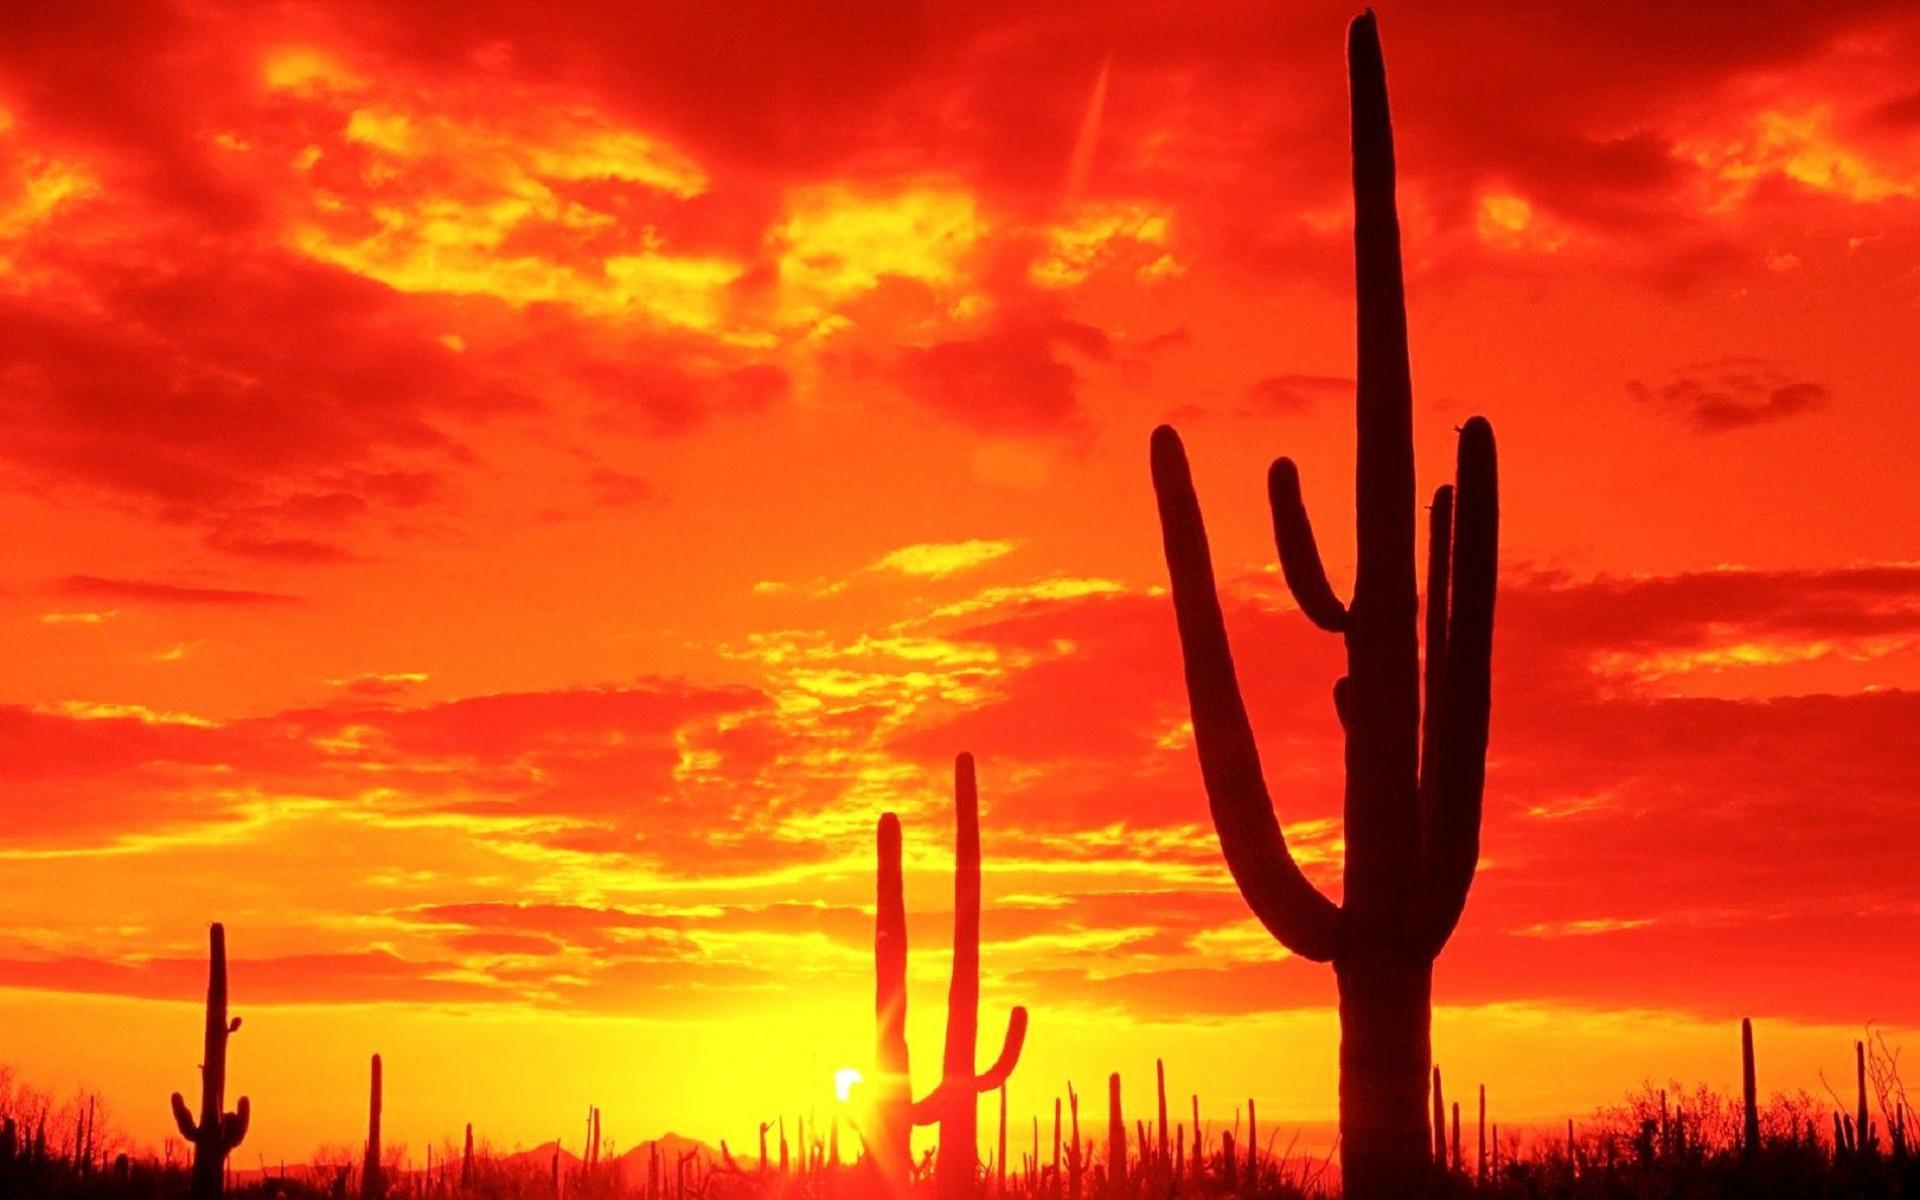 images of cactus